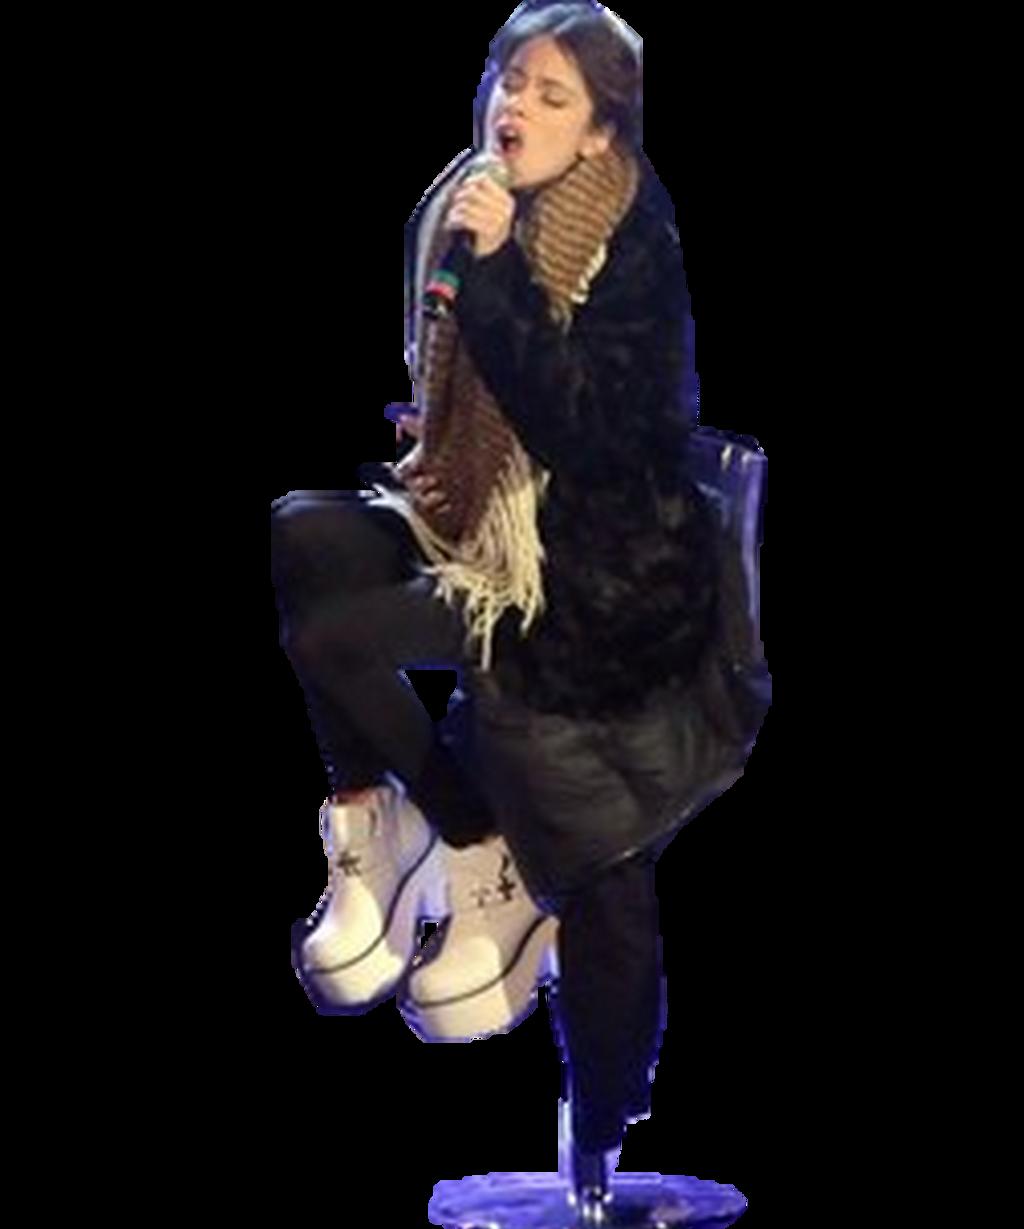 Fotos De Violetta 3 - YouTube